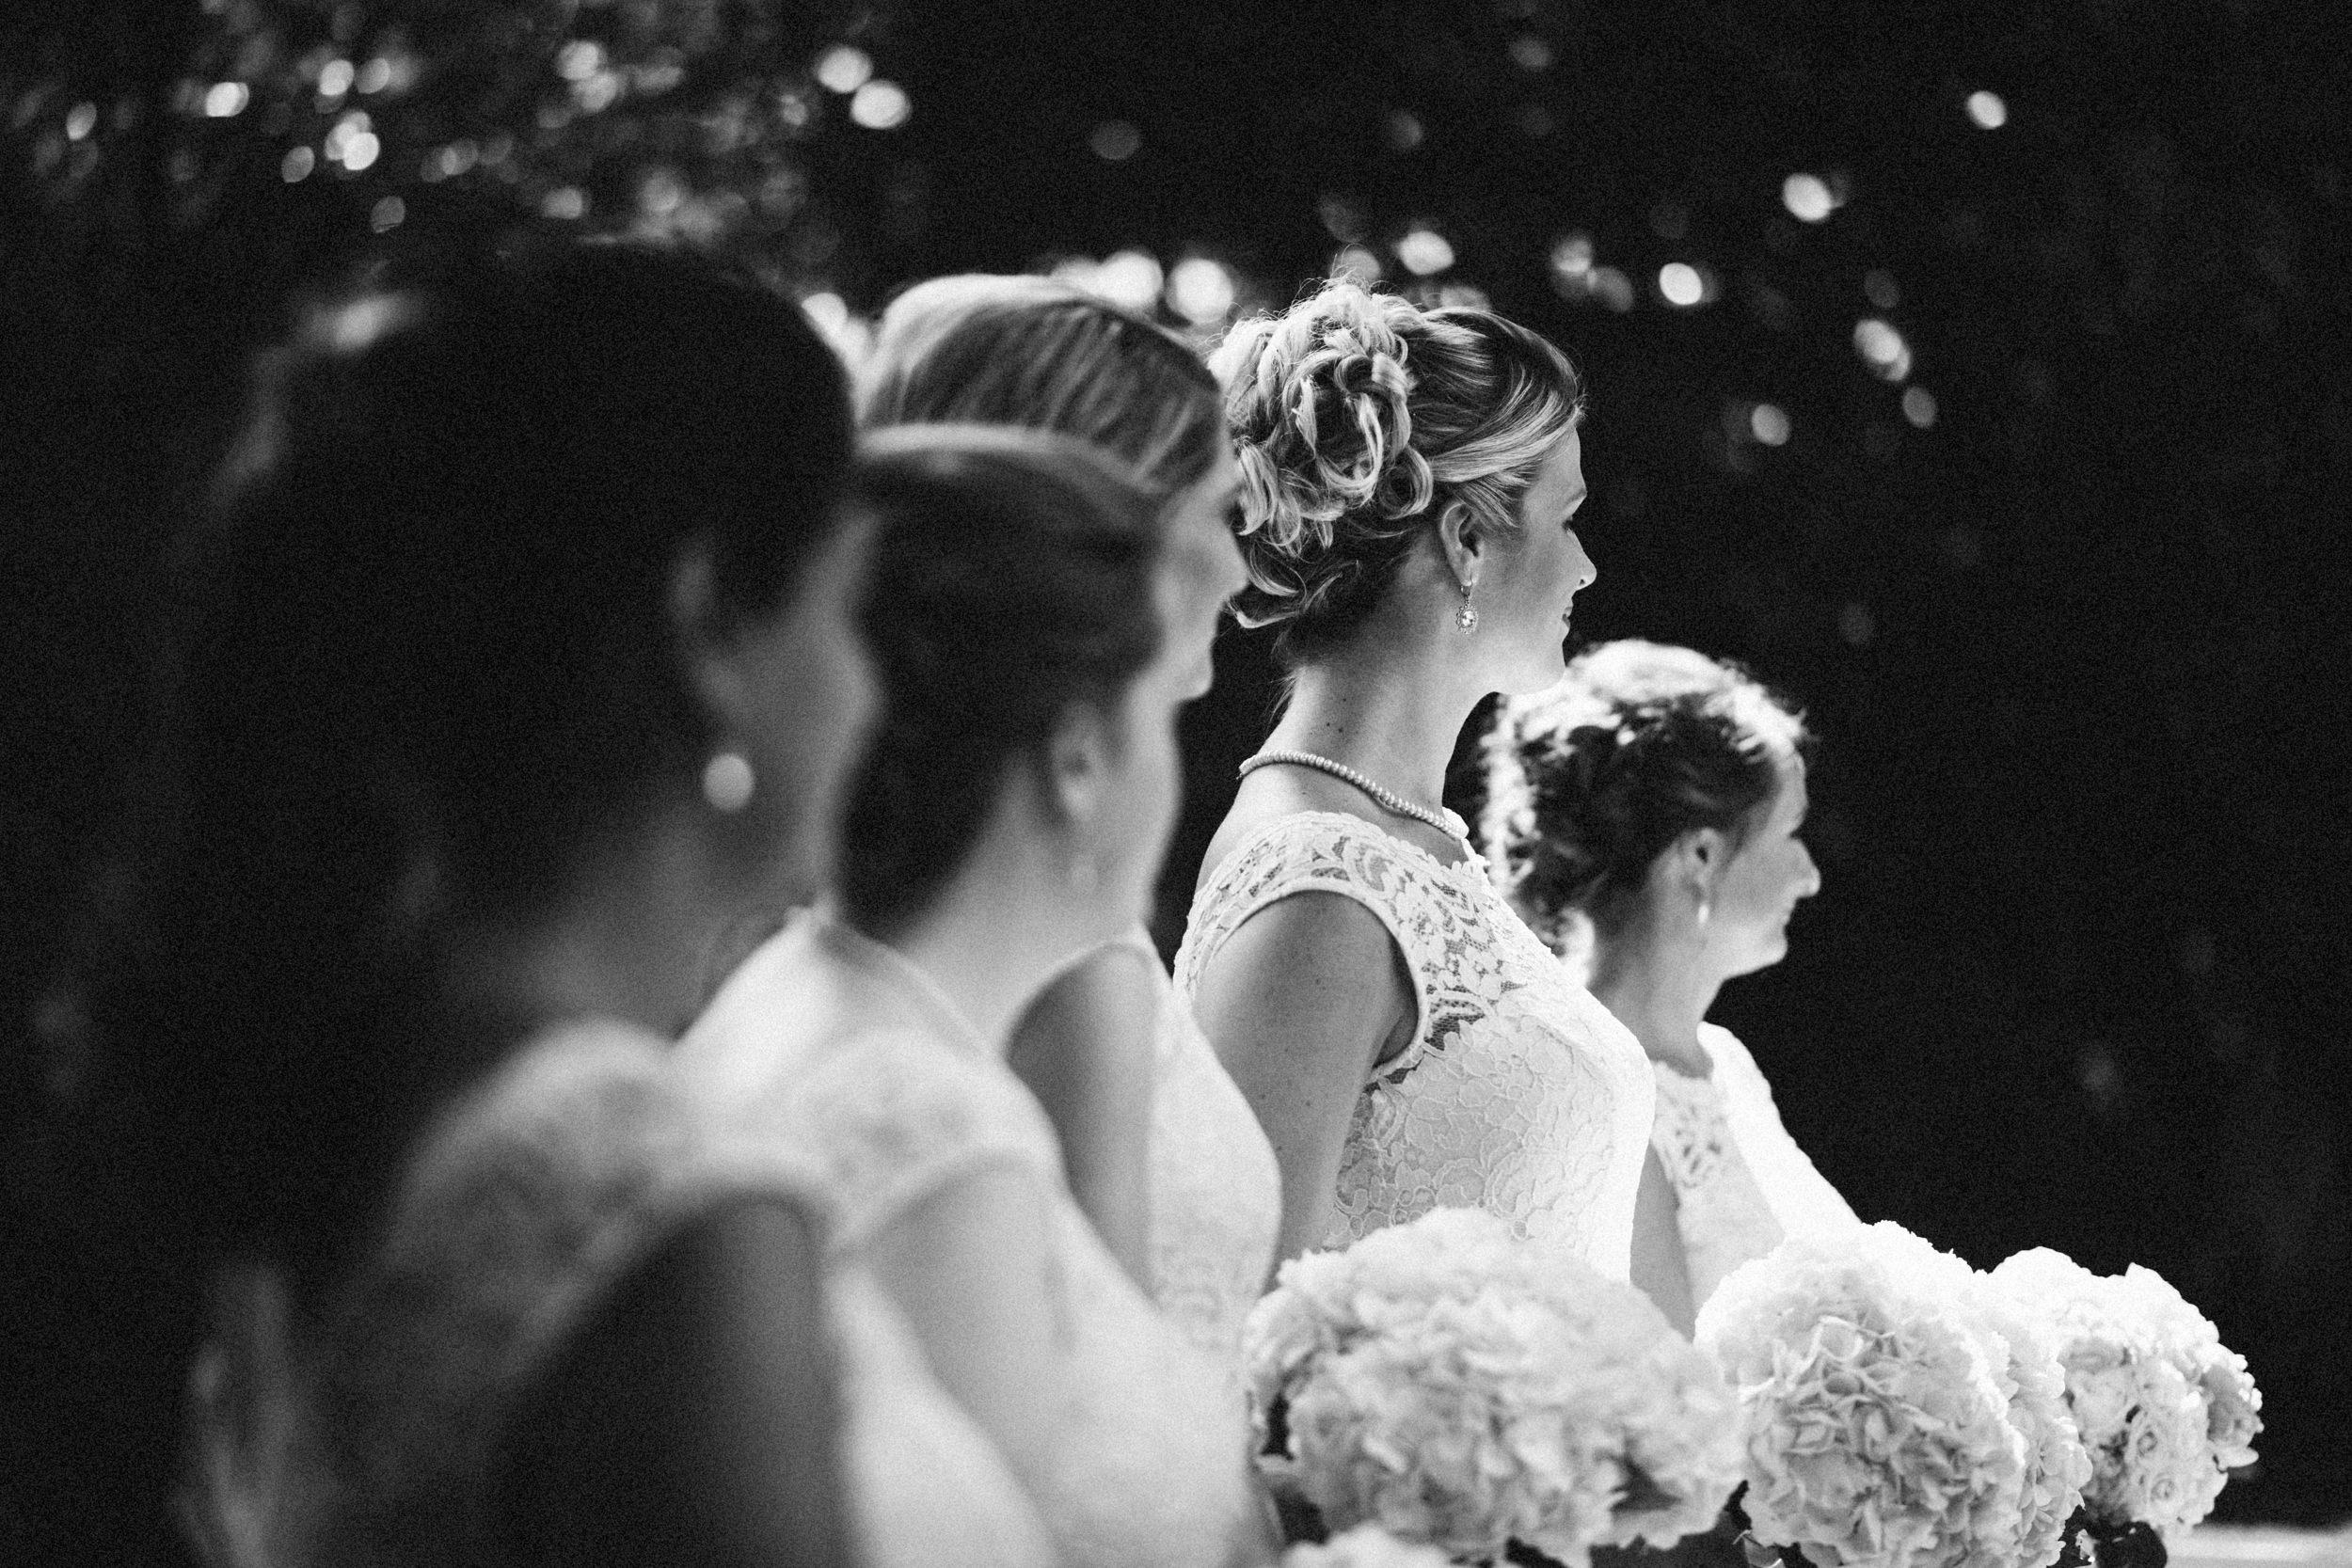 Louisville-Kentucky-Wedding-Elopement-Photographer-Sarah-Katherine-Davis-Photography-Whitehall-Classic-Timeless-Garden-Wedding-359.jpg